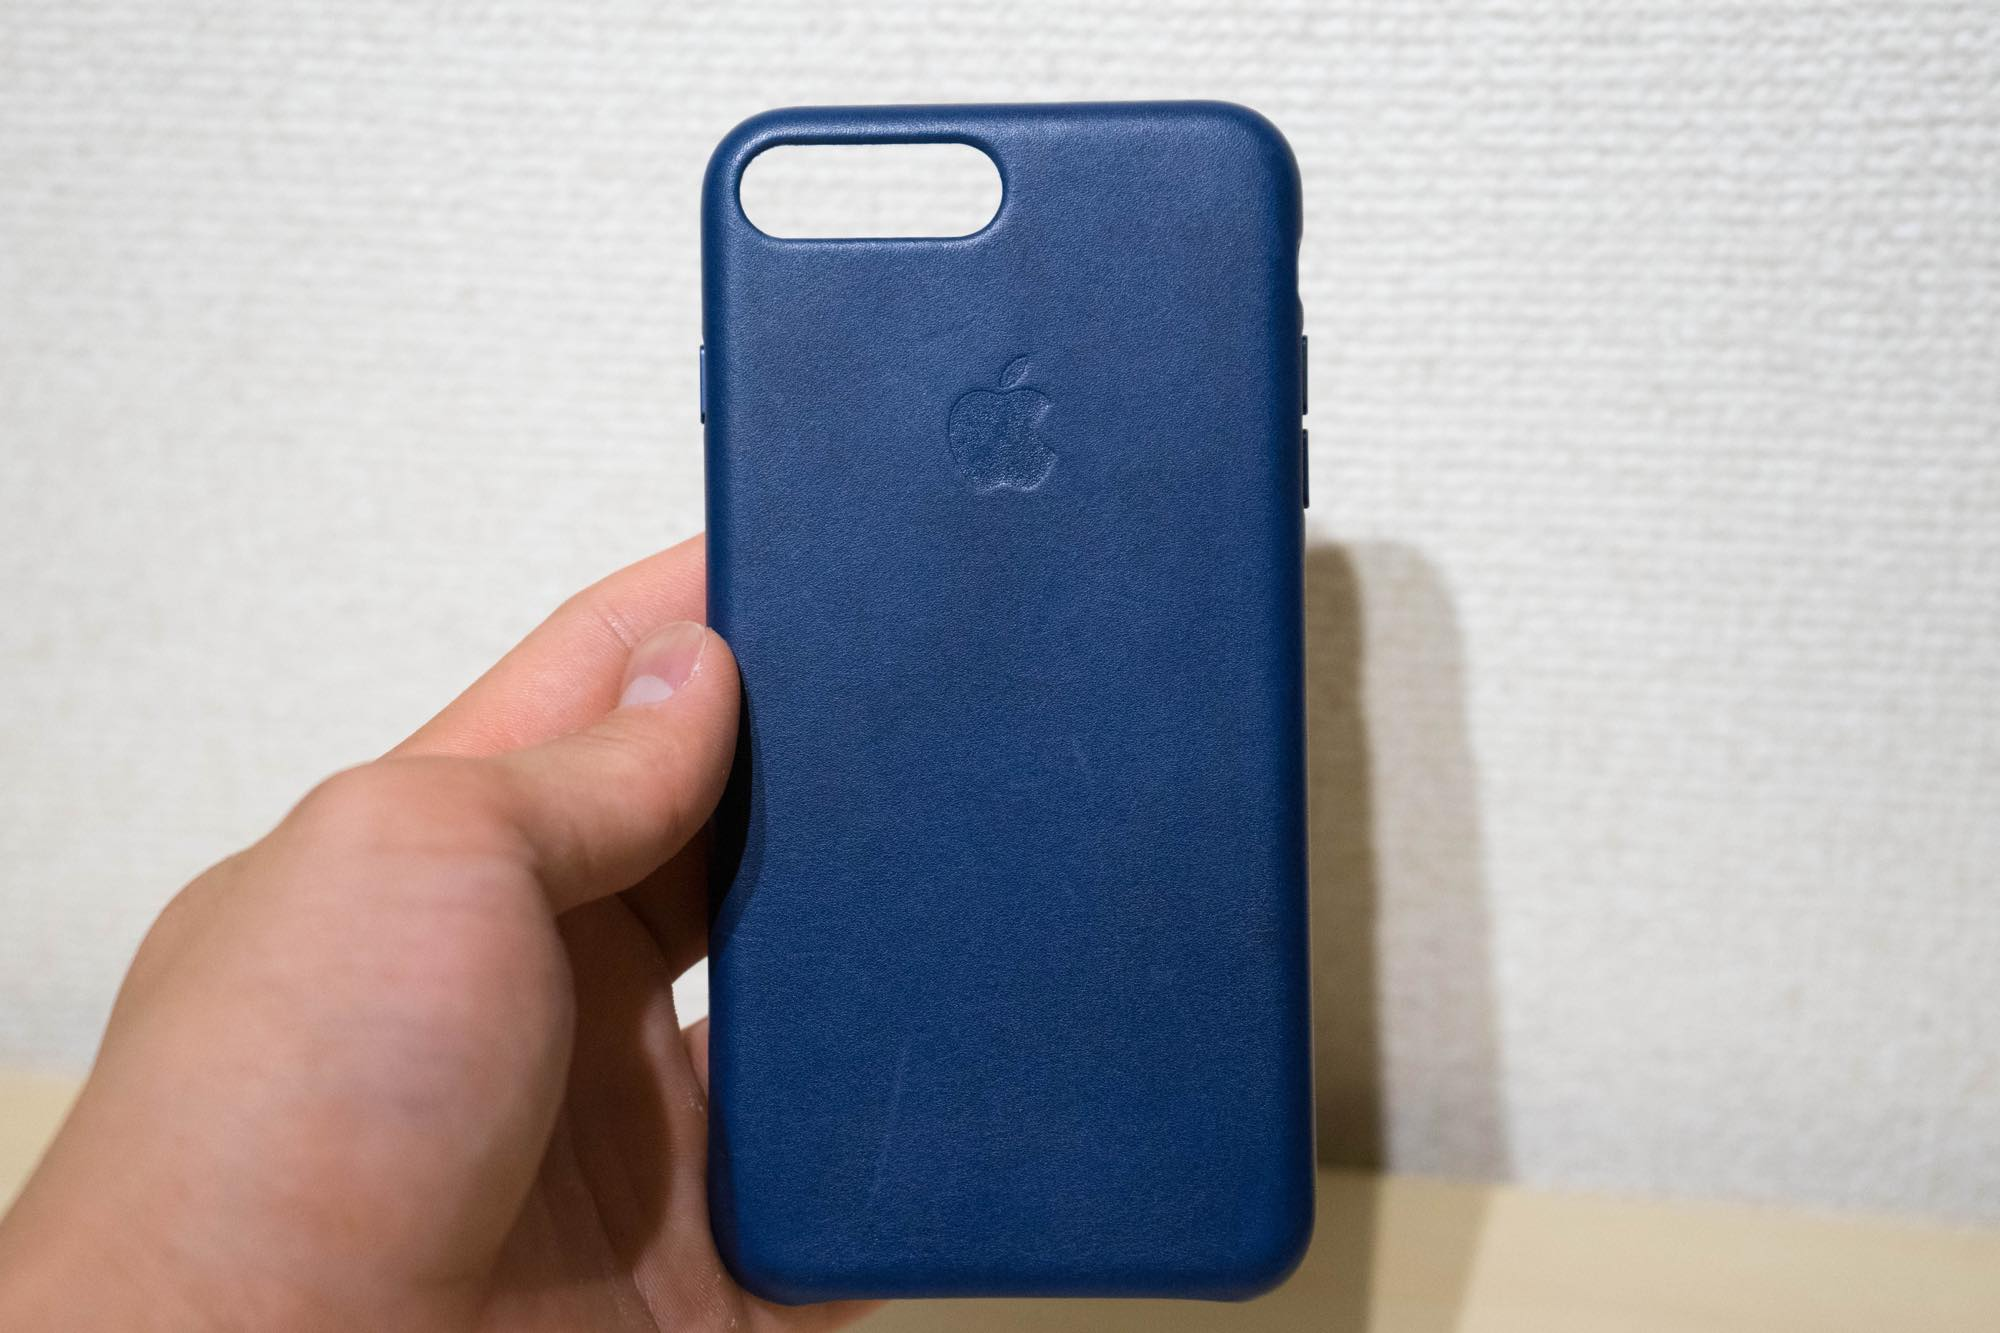 iphone7plus-leathercase-midnightblue3